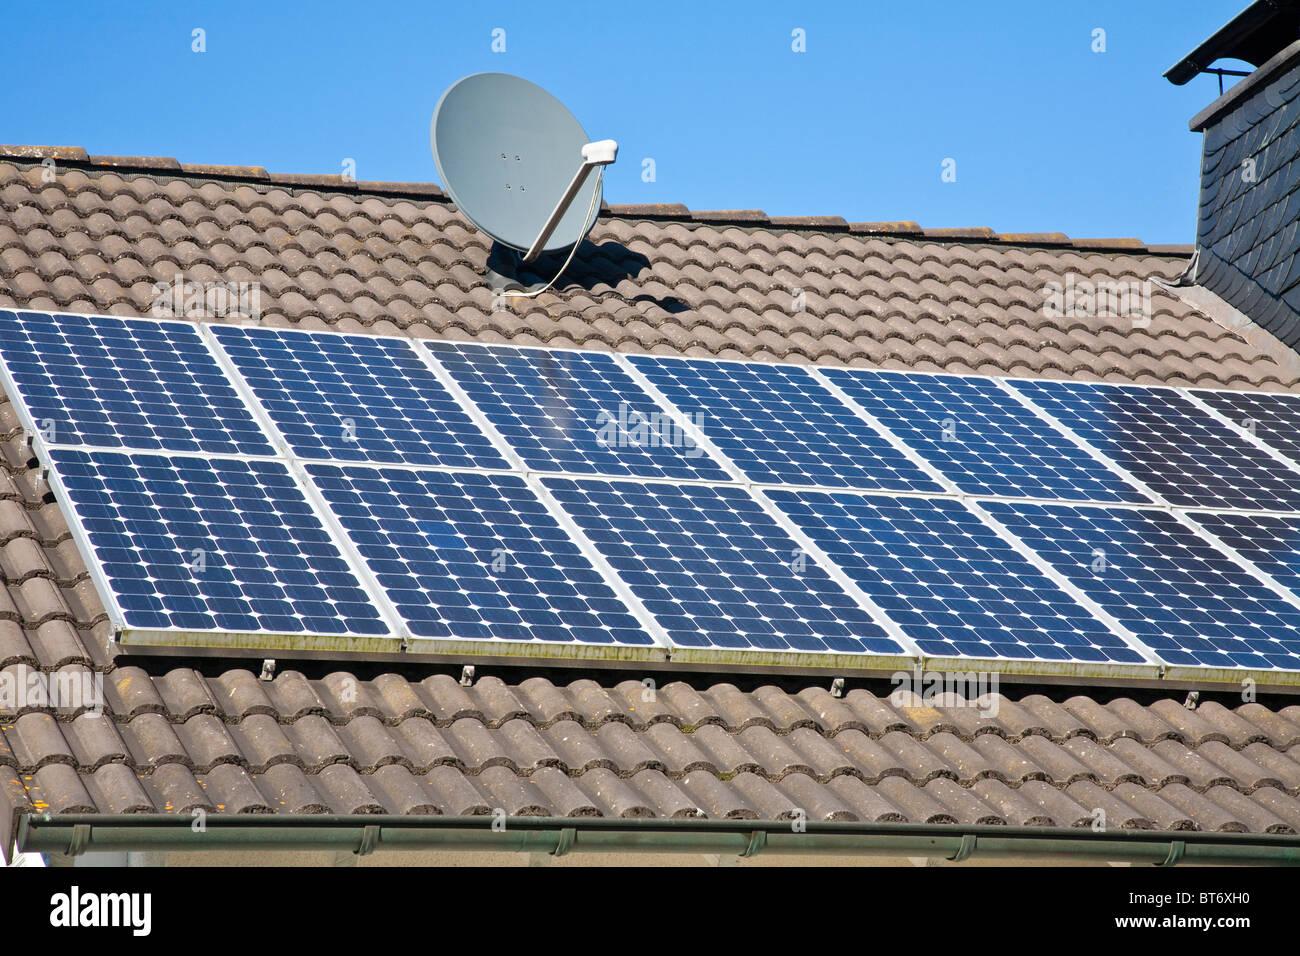 Solar roof panels - Stock Image